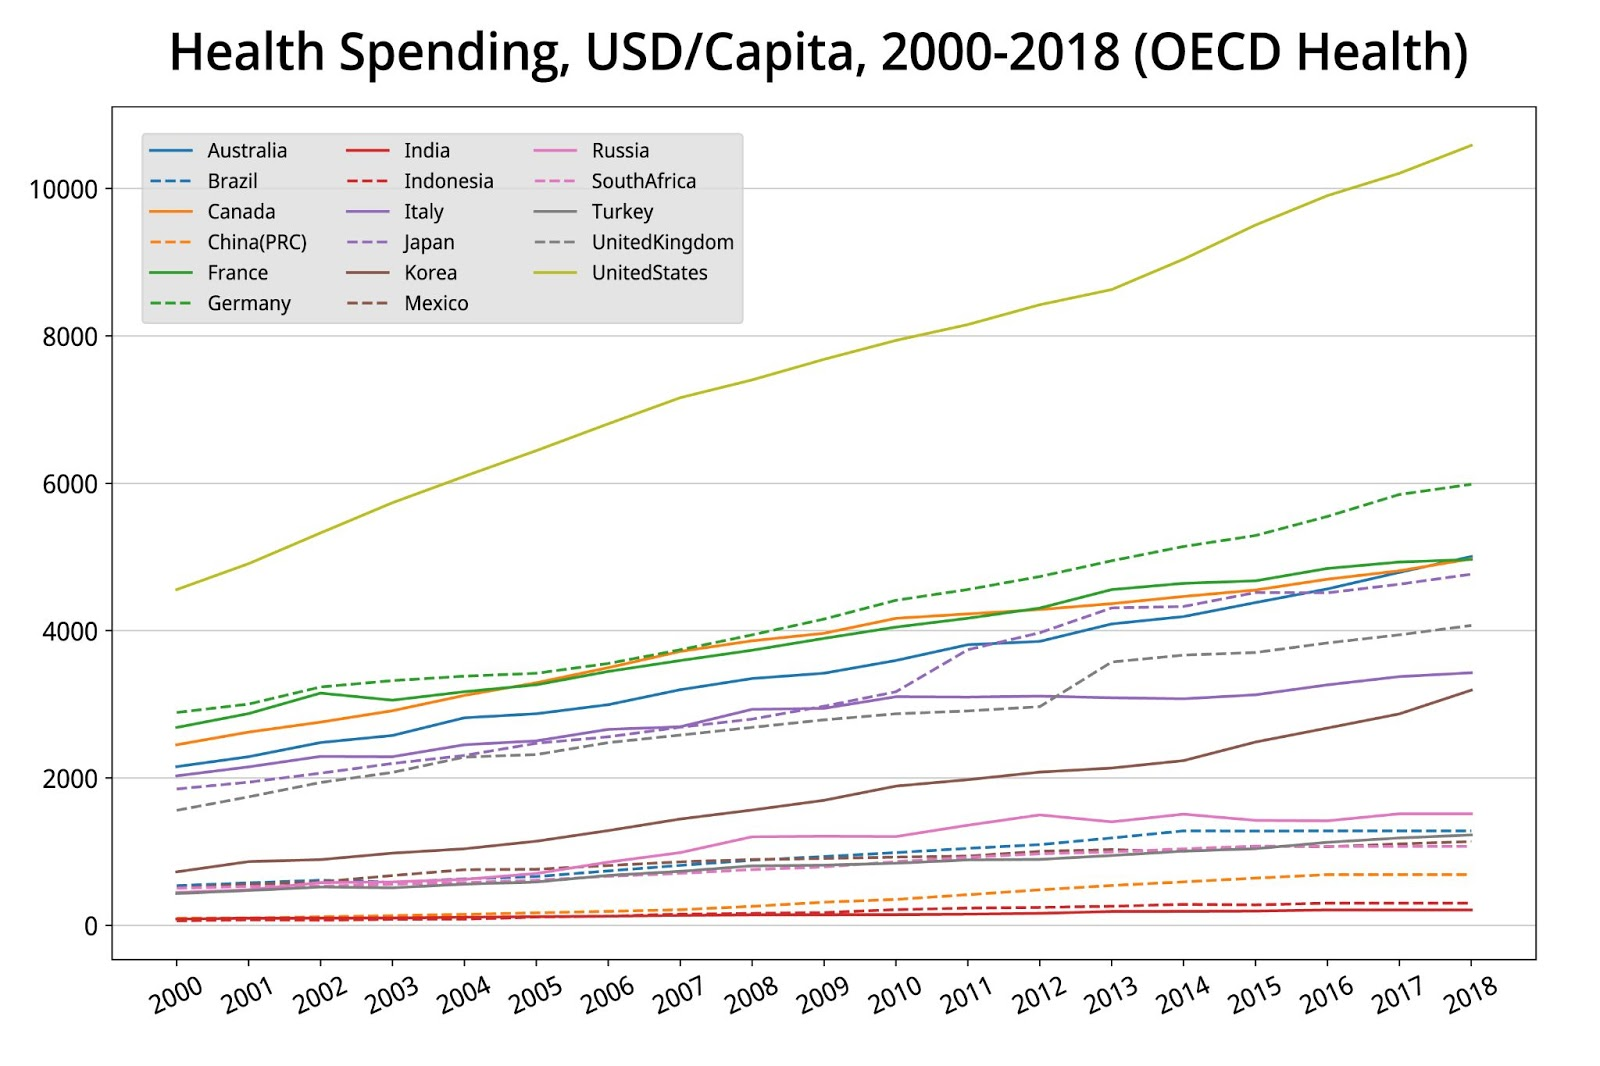 Health Spending Per Capita in G20 Countries